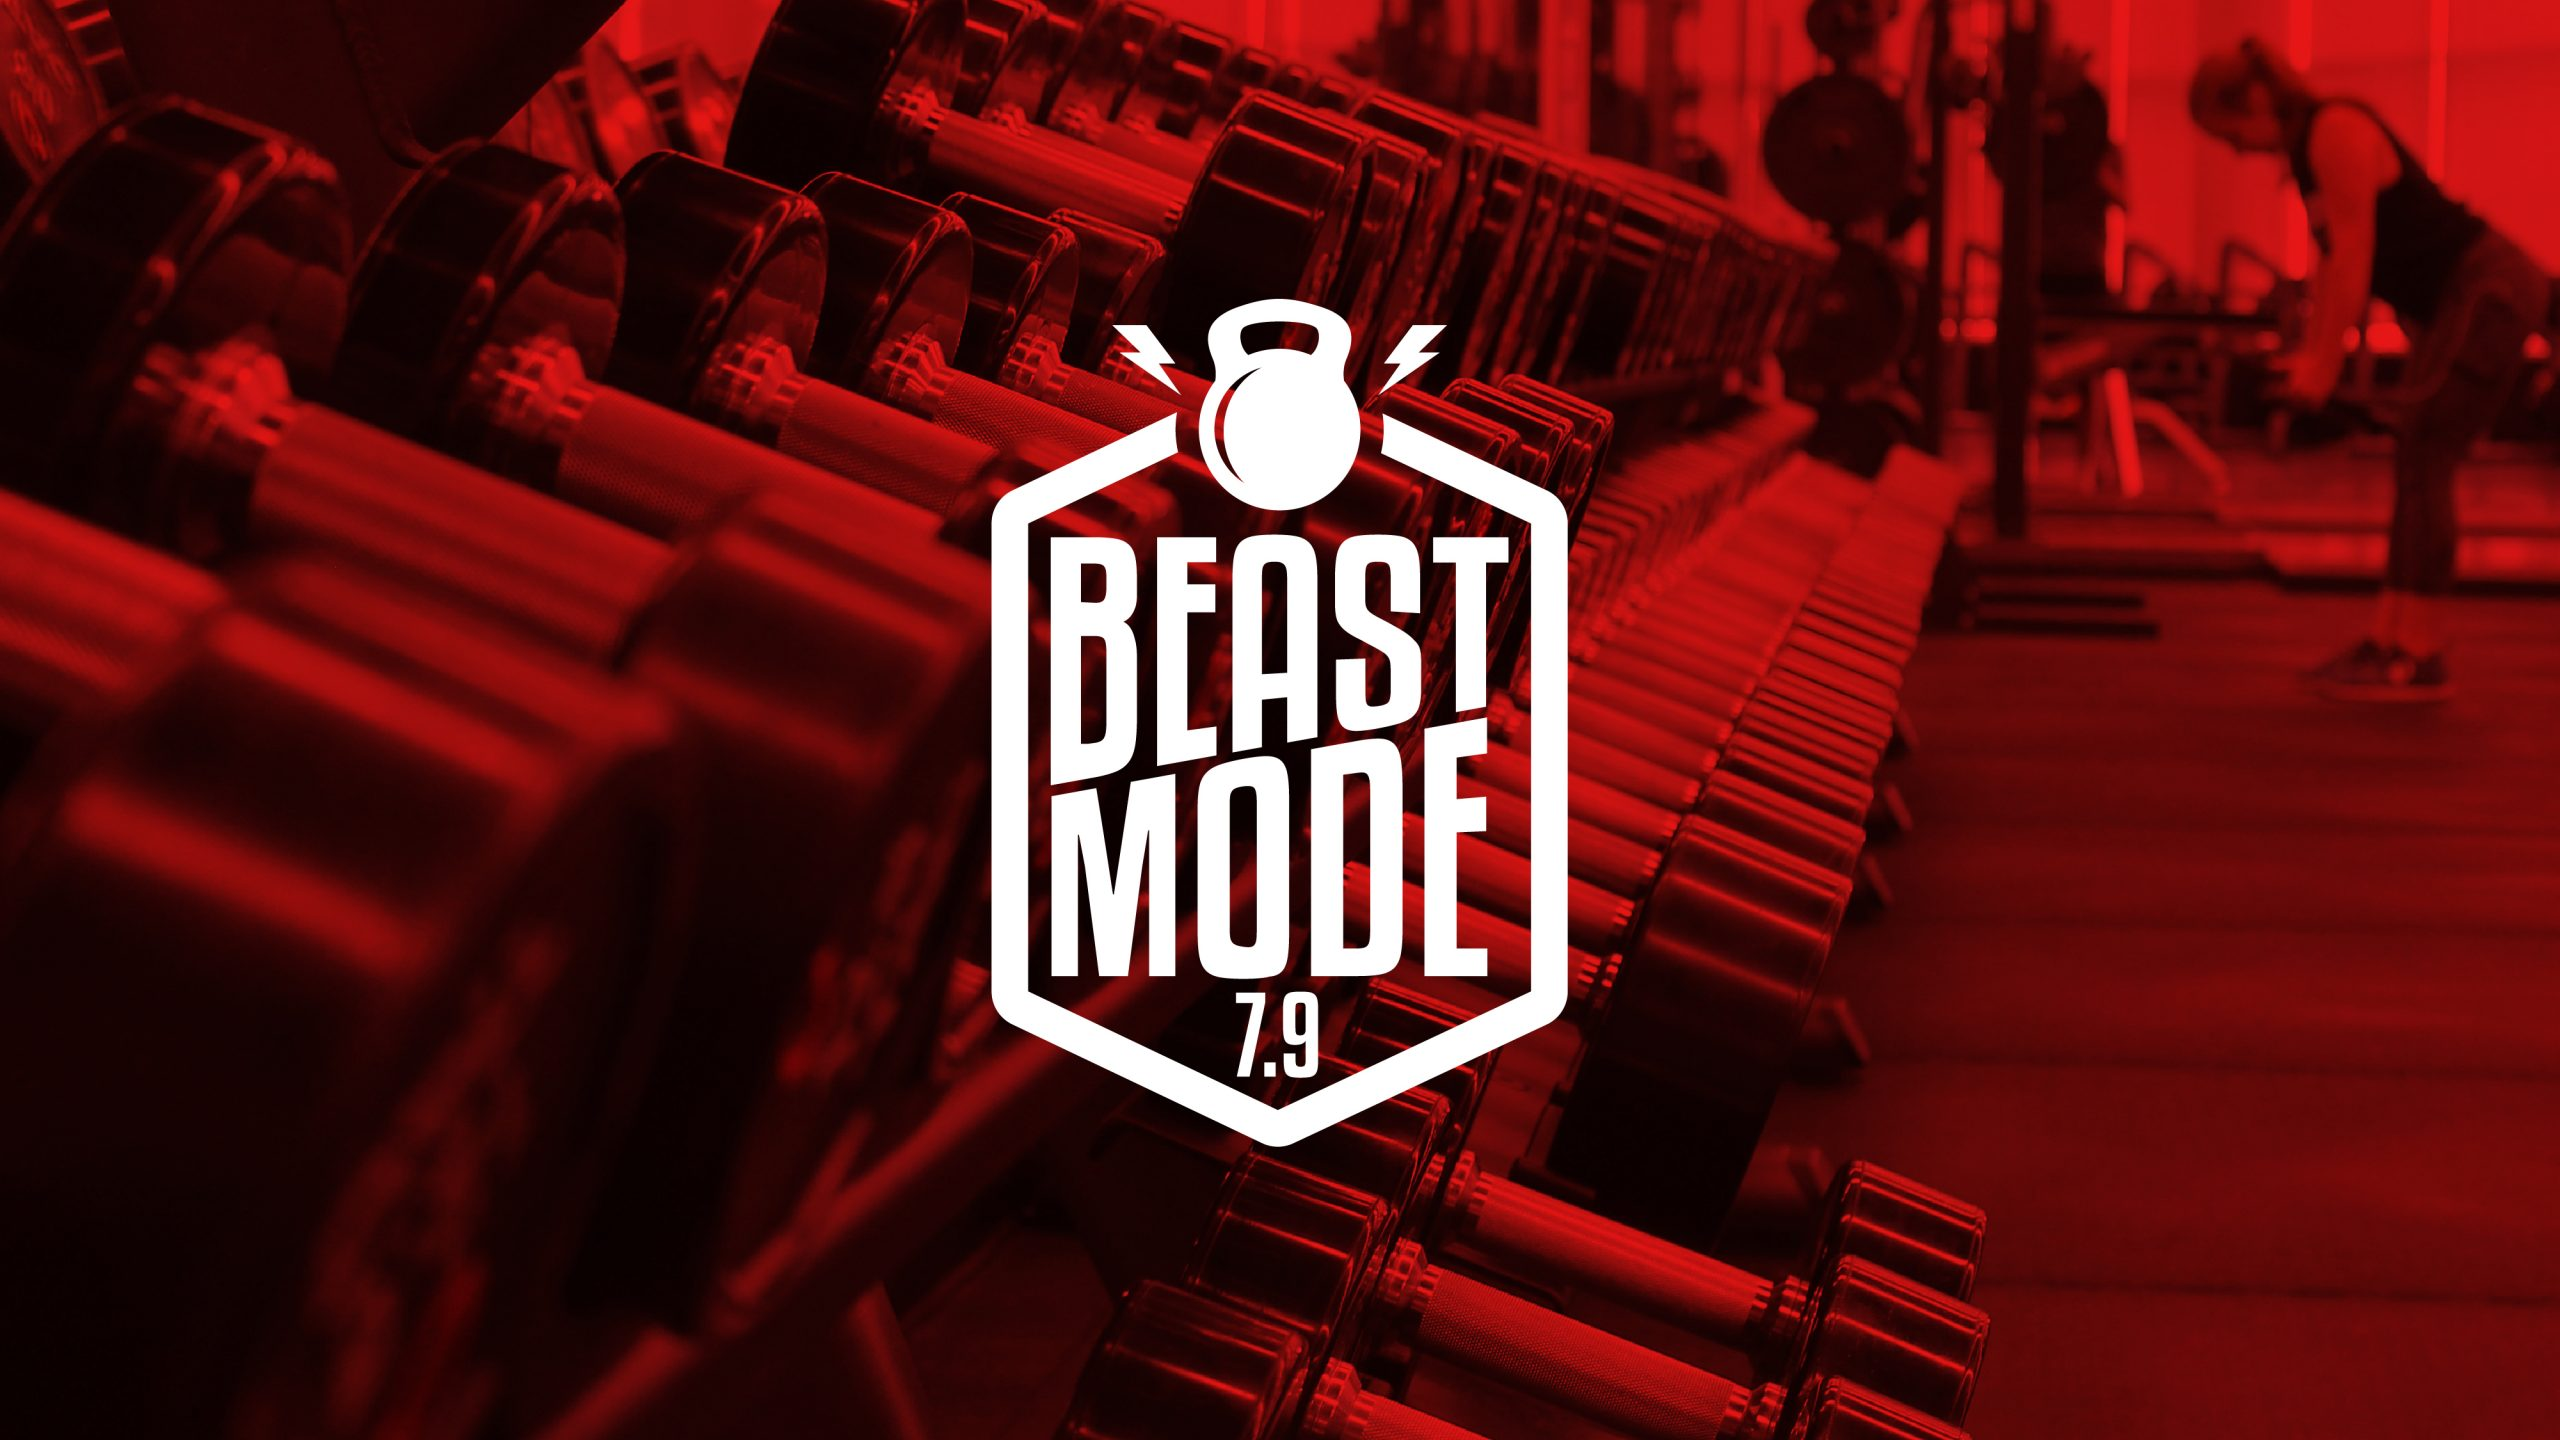 Beat Mode 7.9